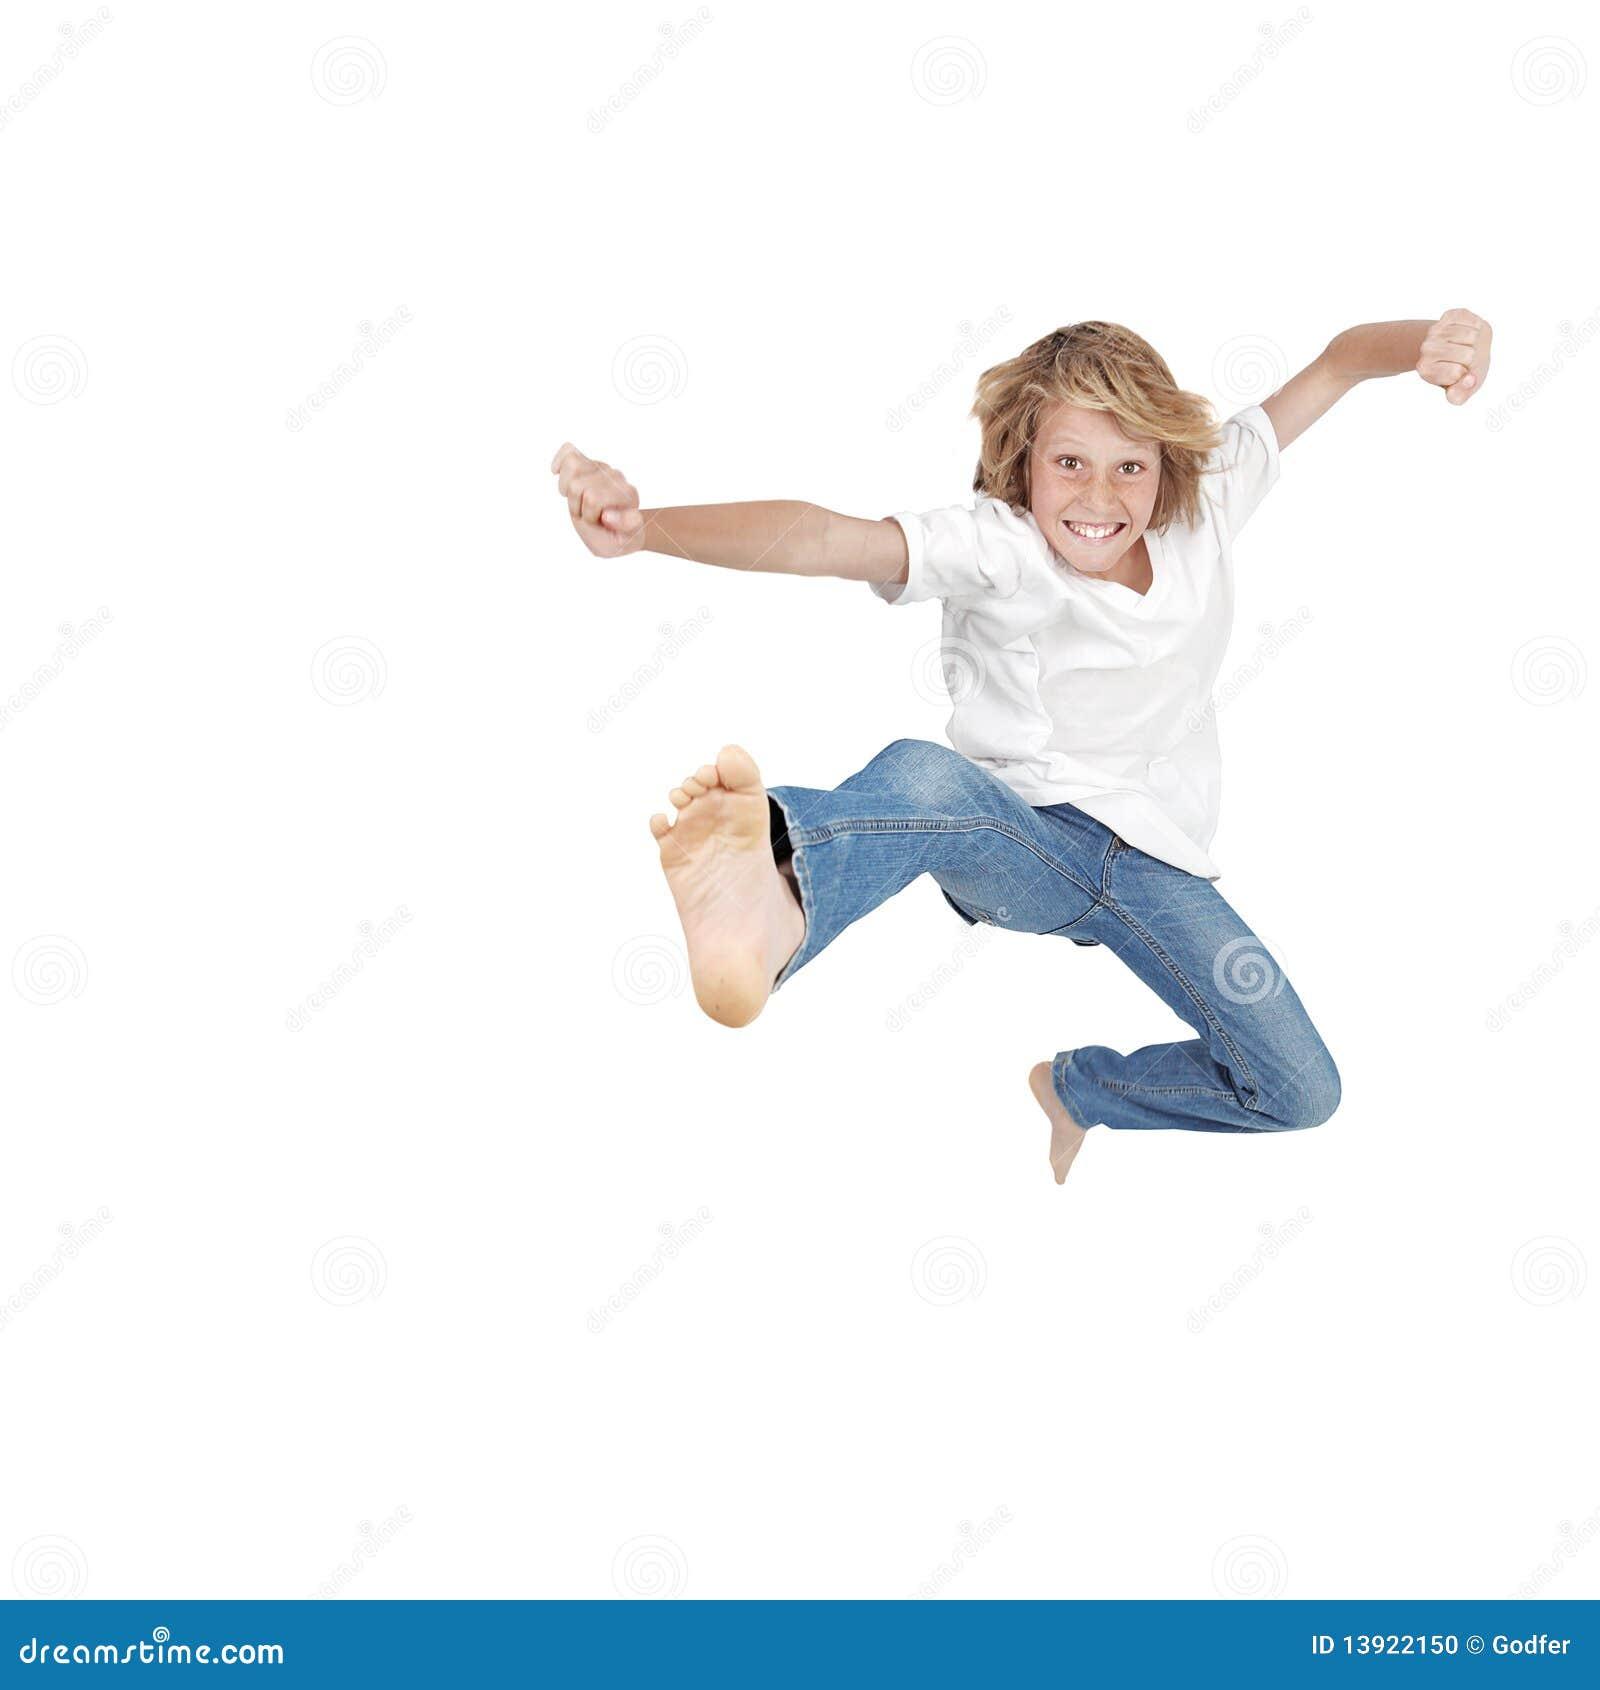 kid jumping images - usseek.com